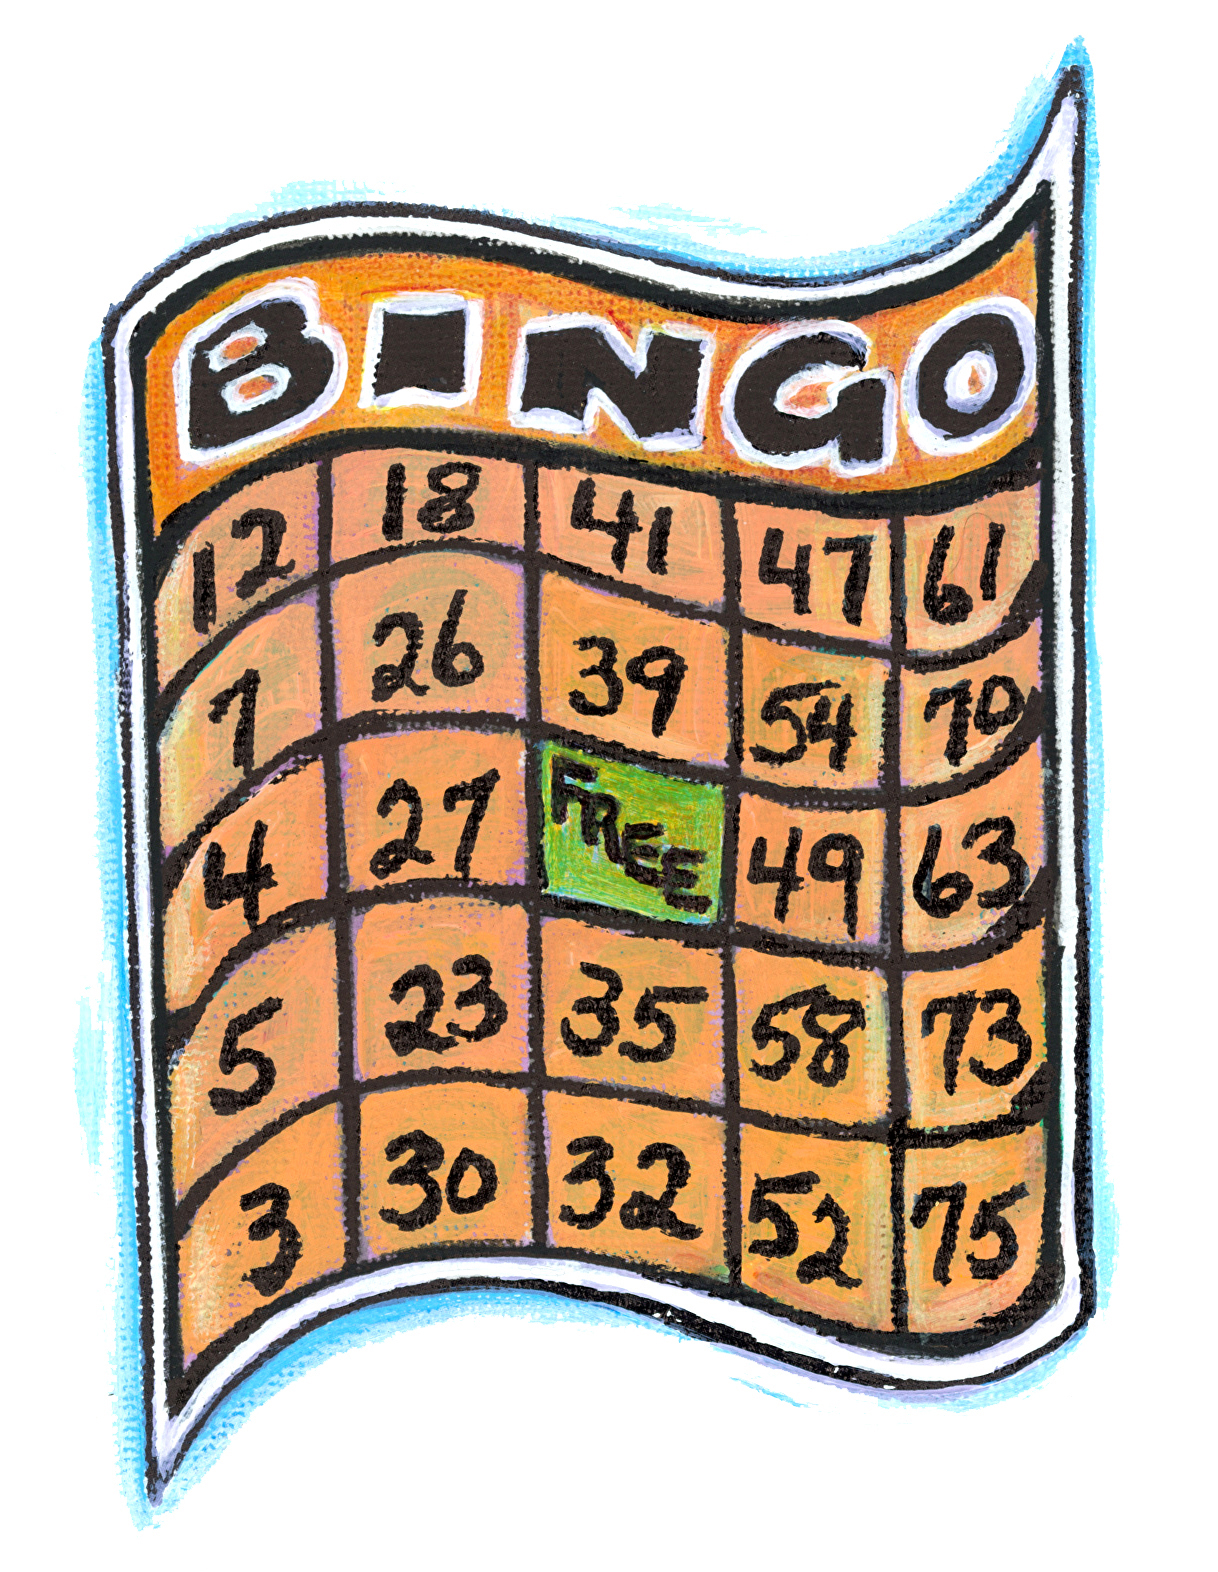 Bingo bingo card high res clean solutioingenieria Image collections